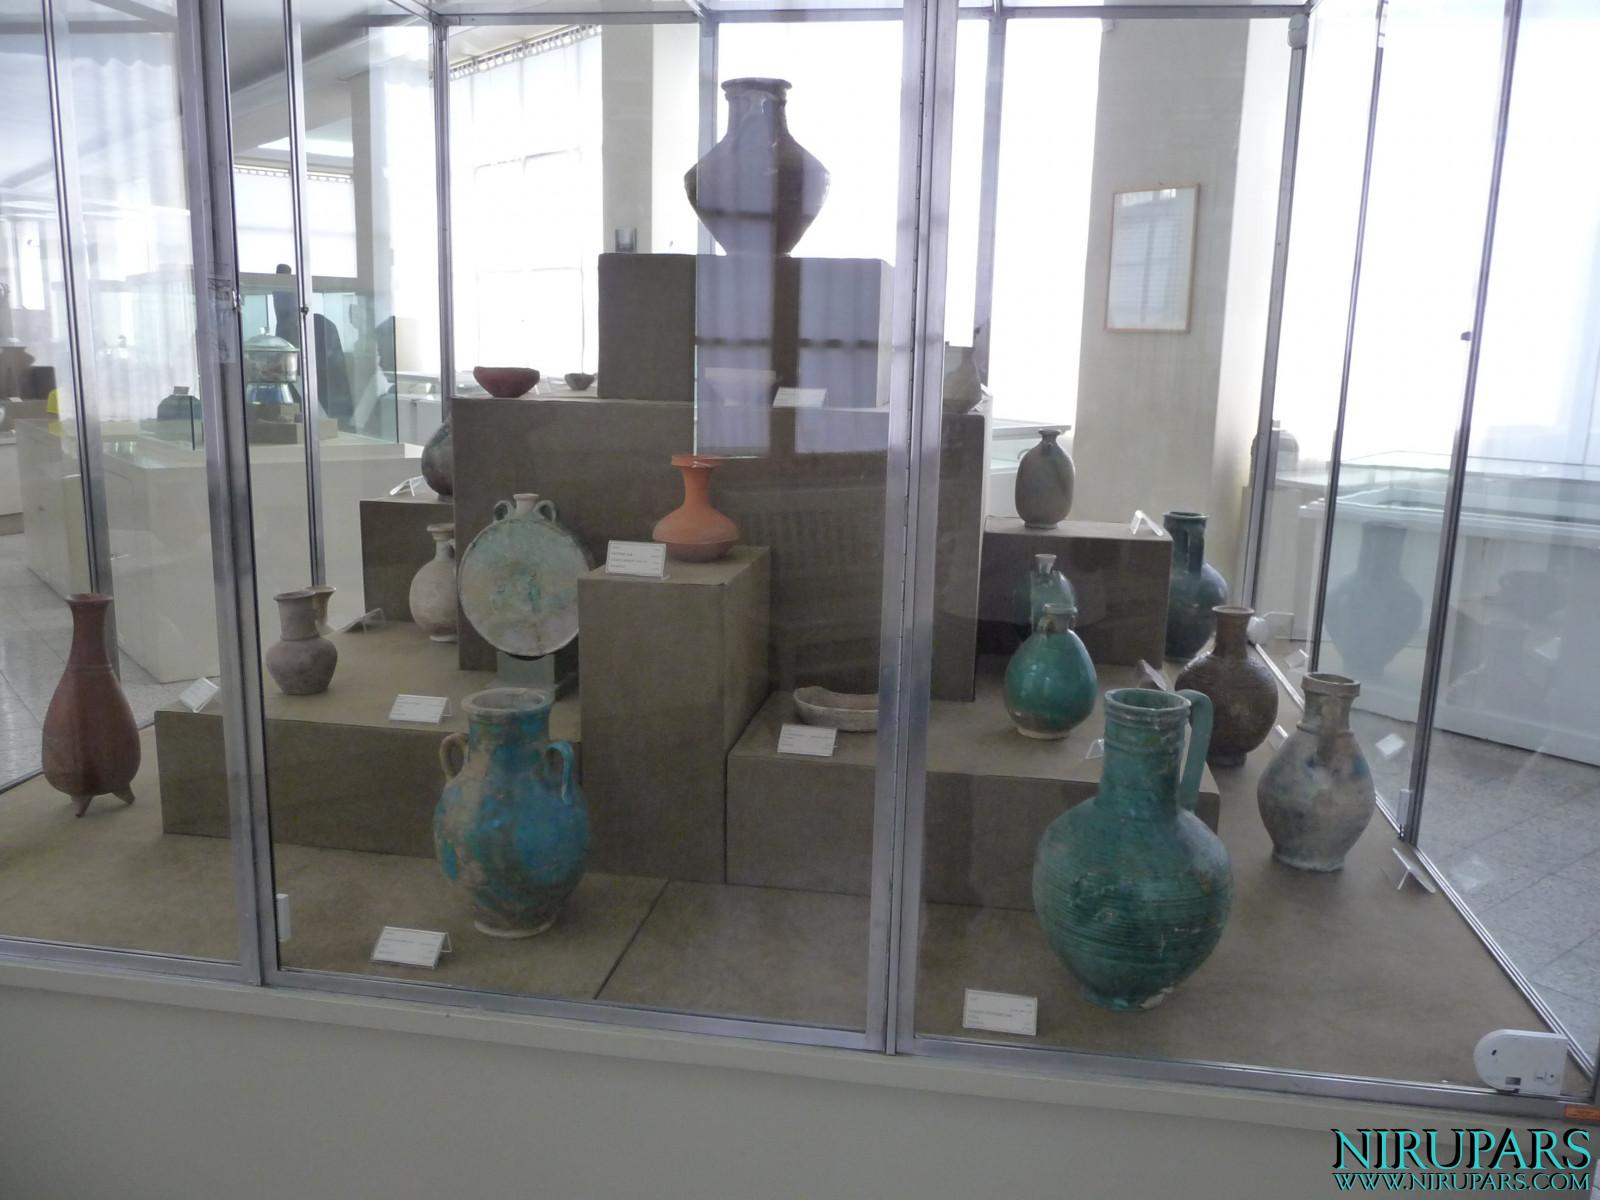 National Museum of Iran - Ceramic Amphoras Jugs Vessels